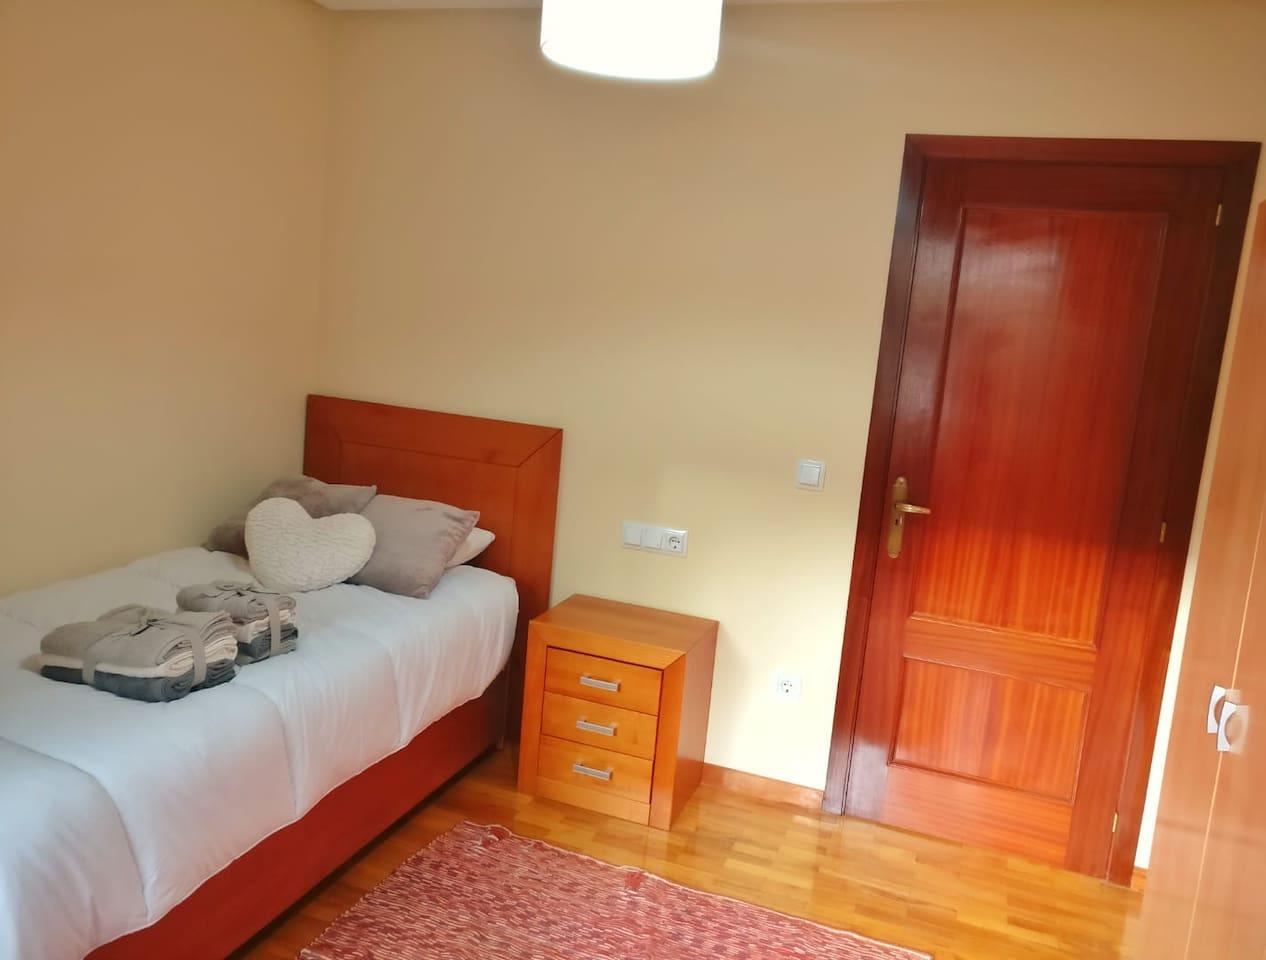 Habitación simple con amplio balcón